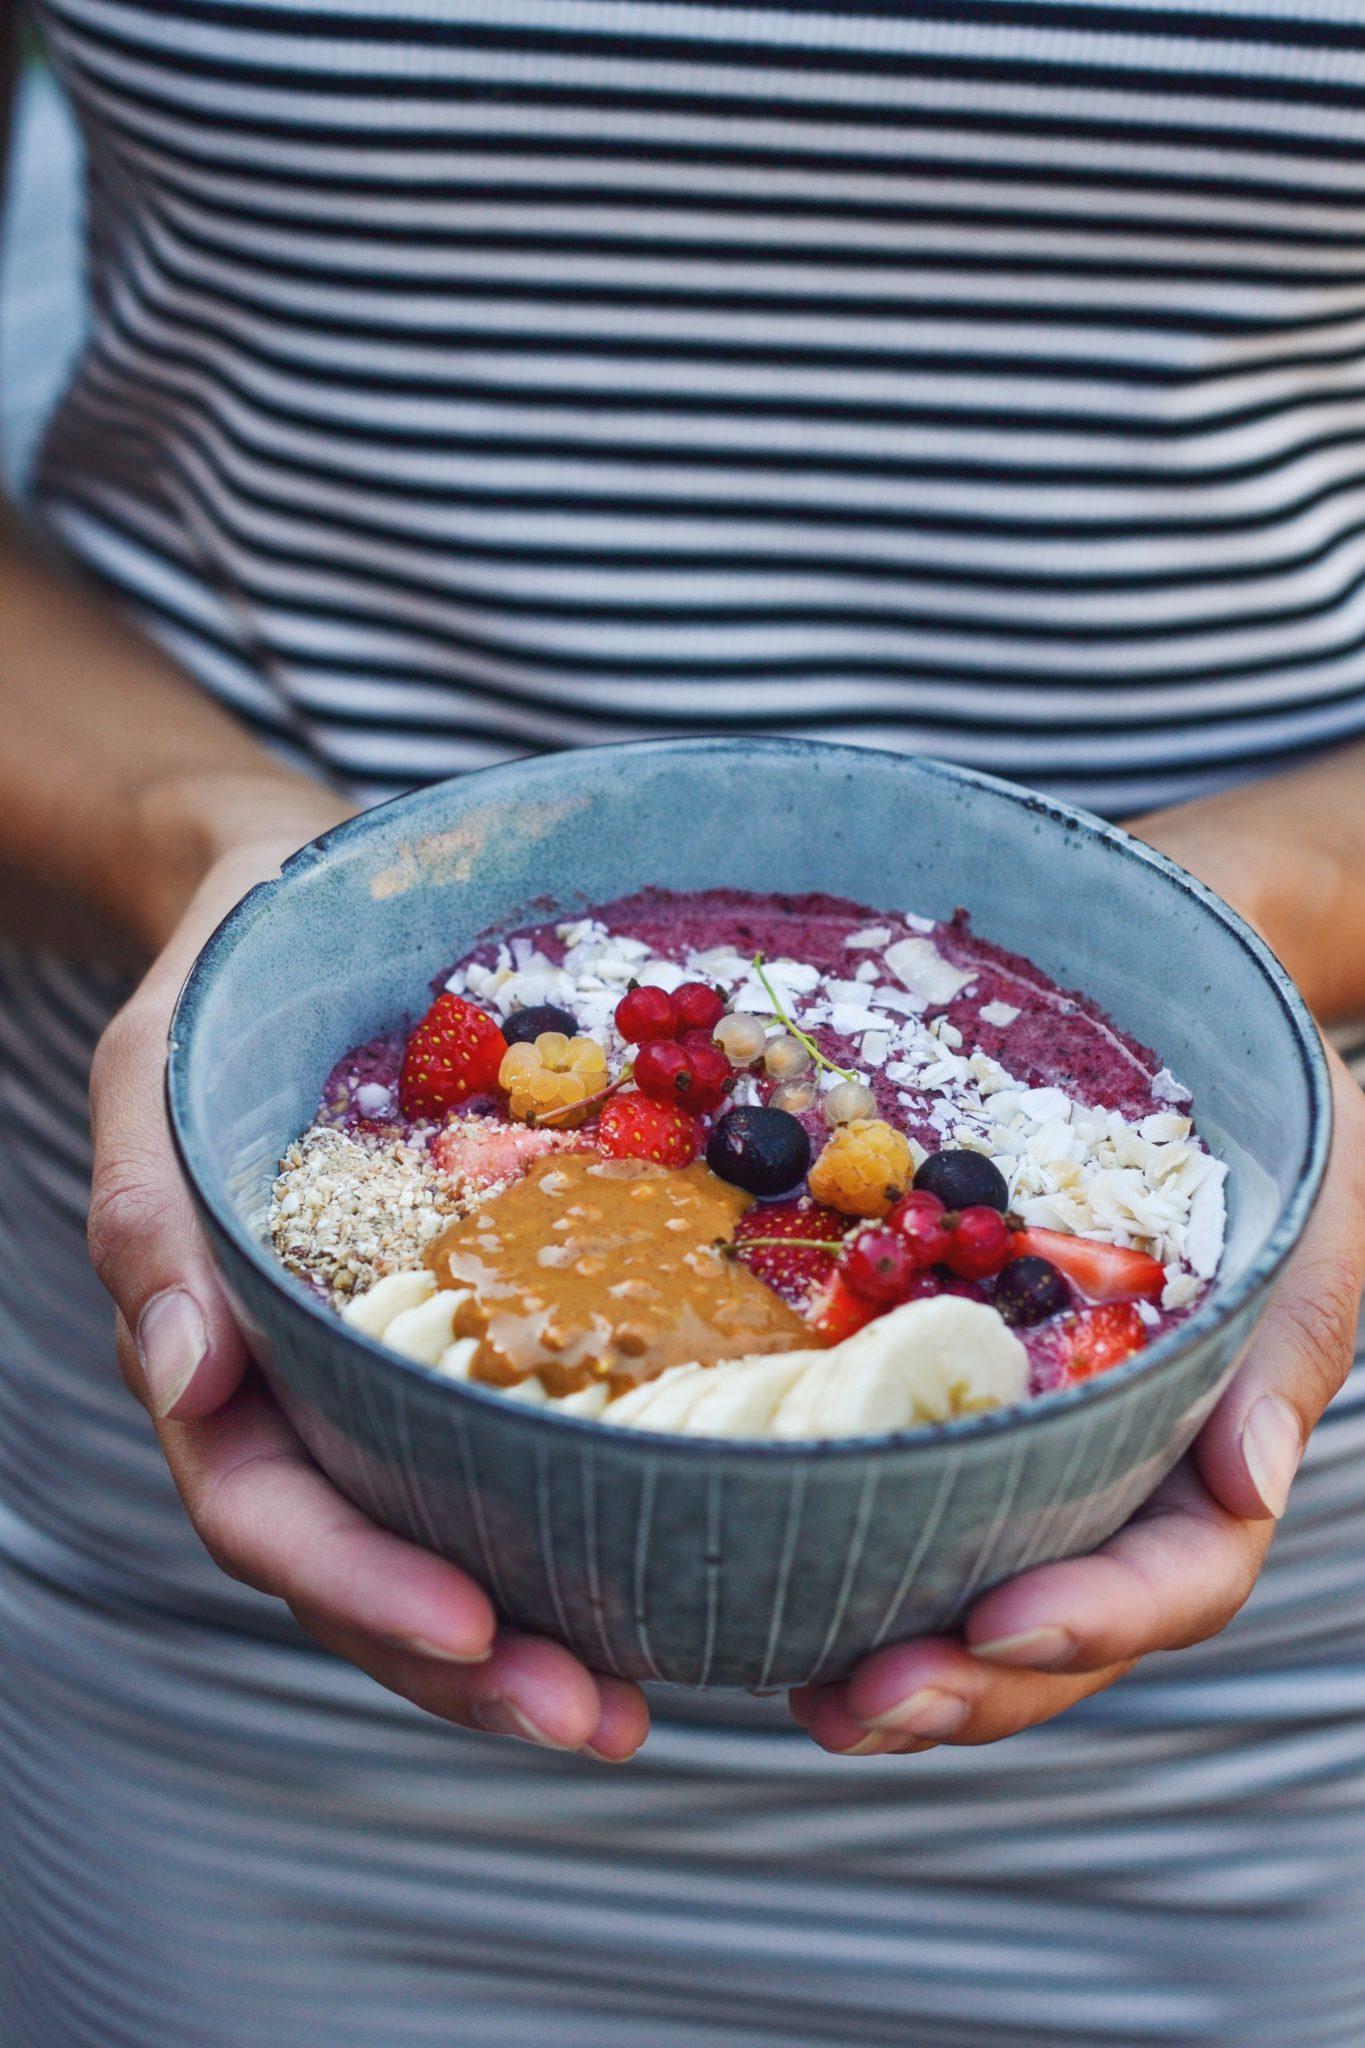 sund smoothie bowl med brombær, blåbær og banan